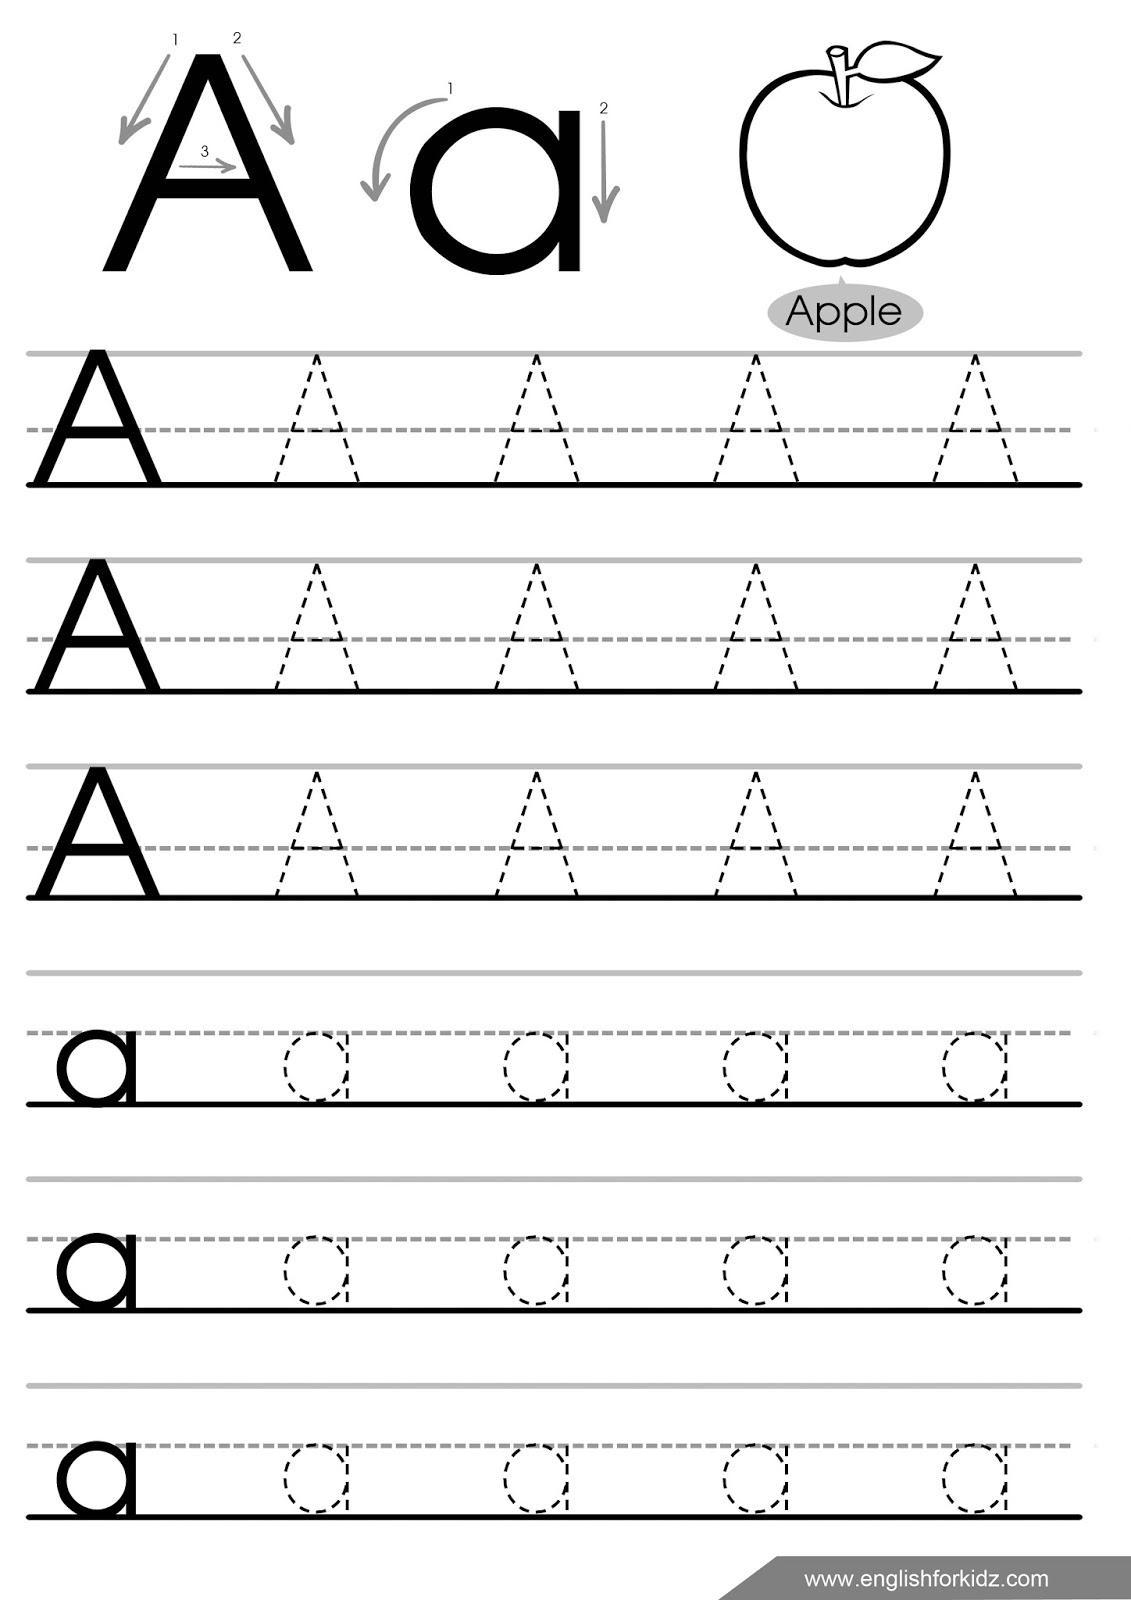 Math Worksheet : Alphabet Tracing Worksheets For regarding Letter Tracing Exercises